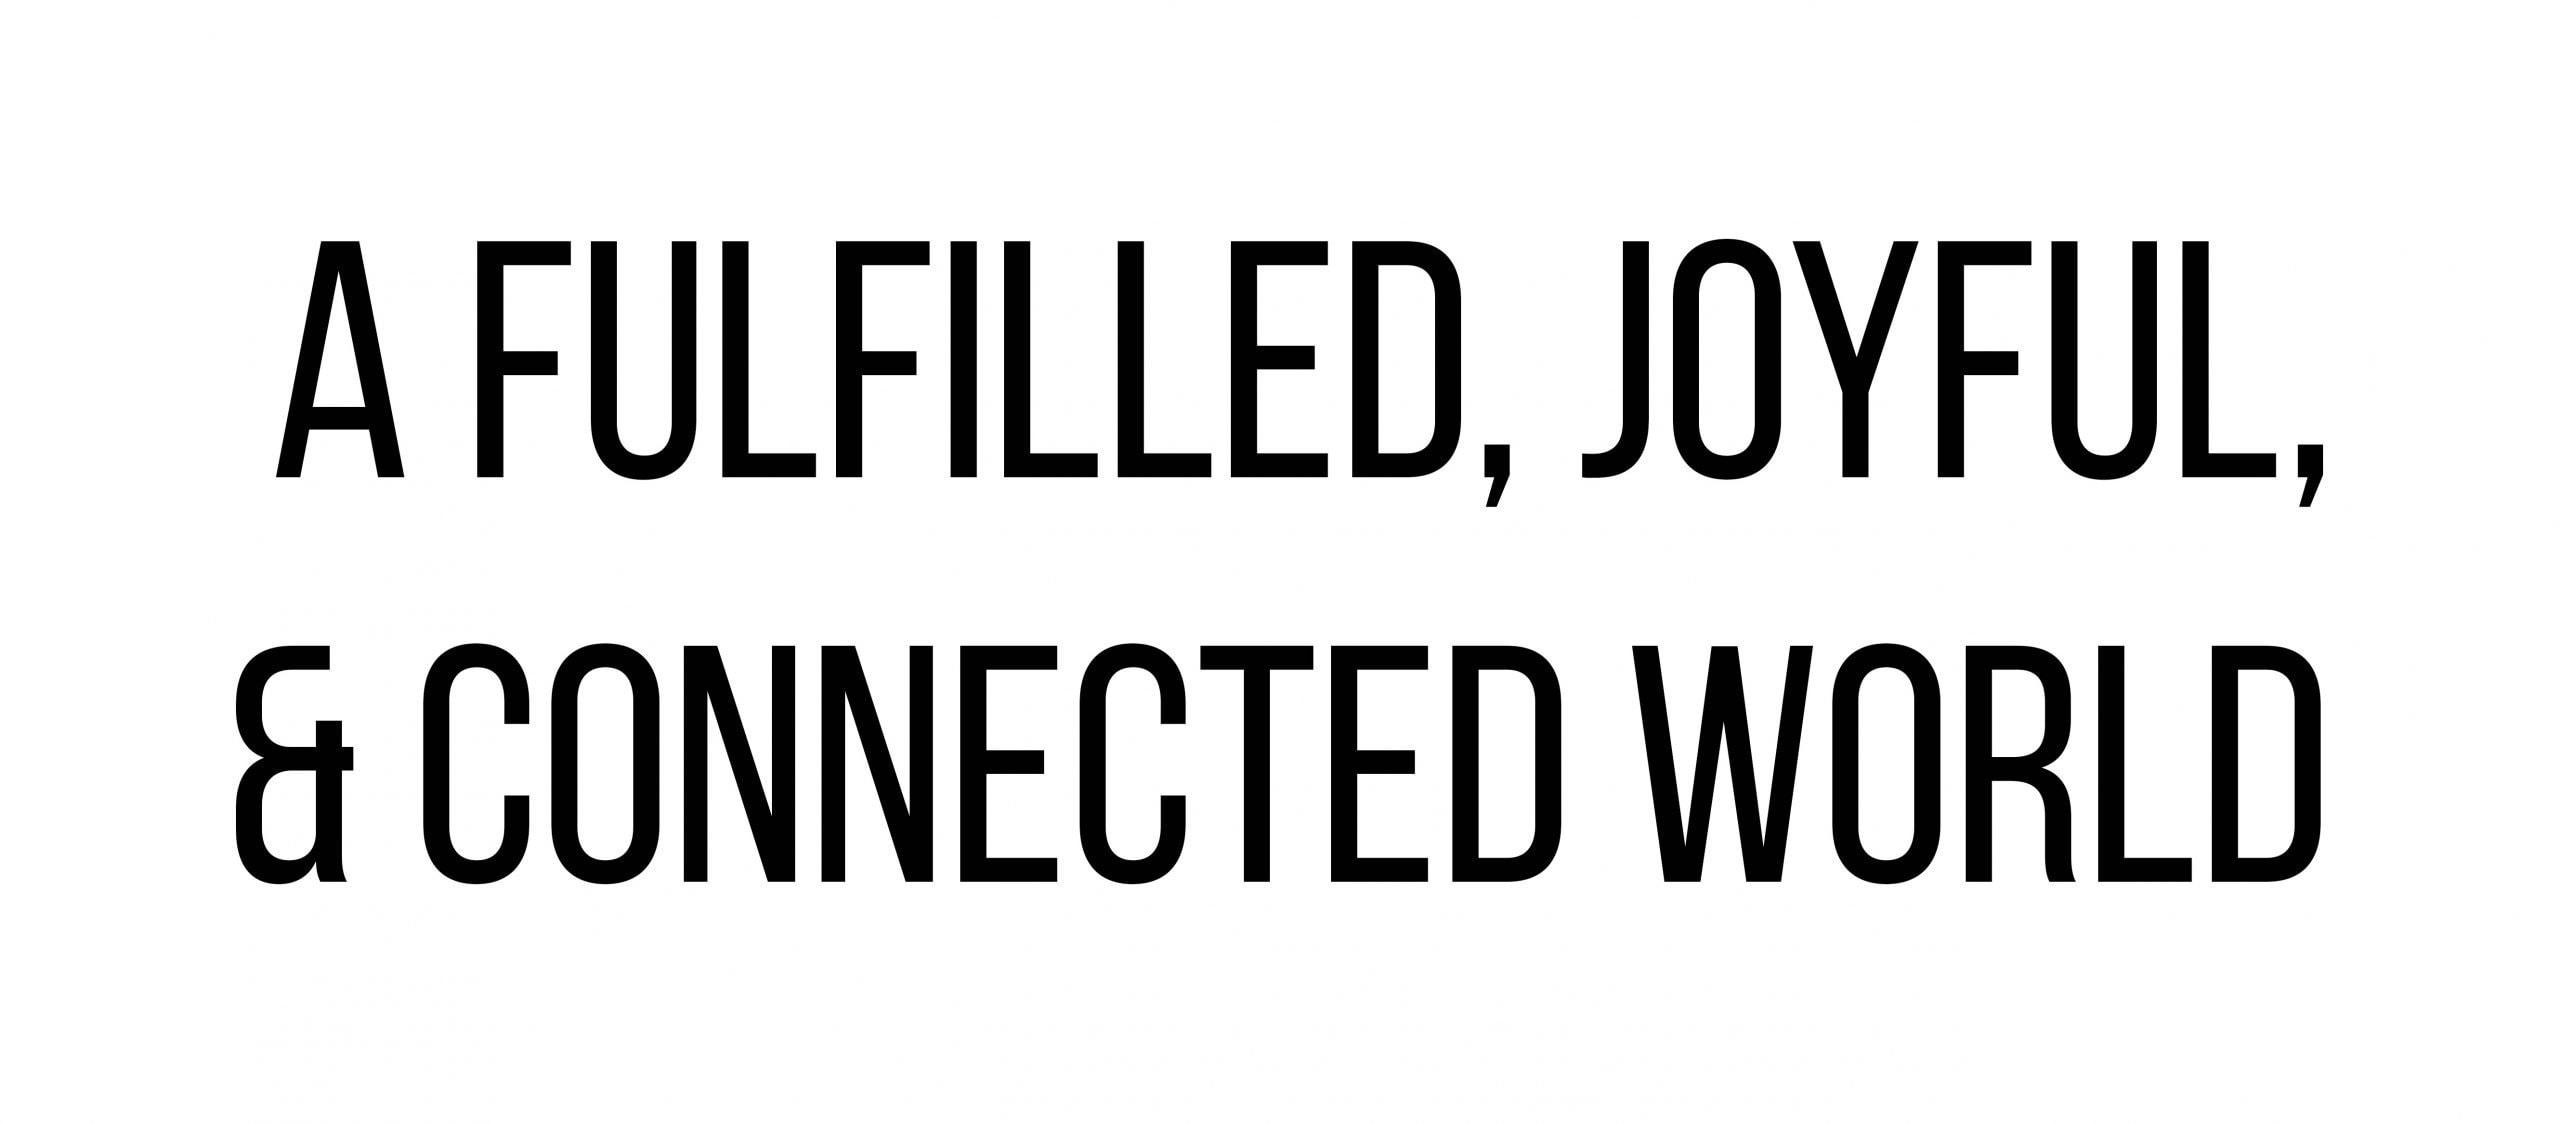 A Fullfillied, Joyful, & Connected World